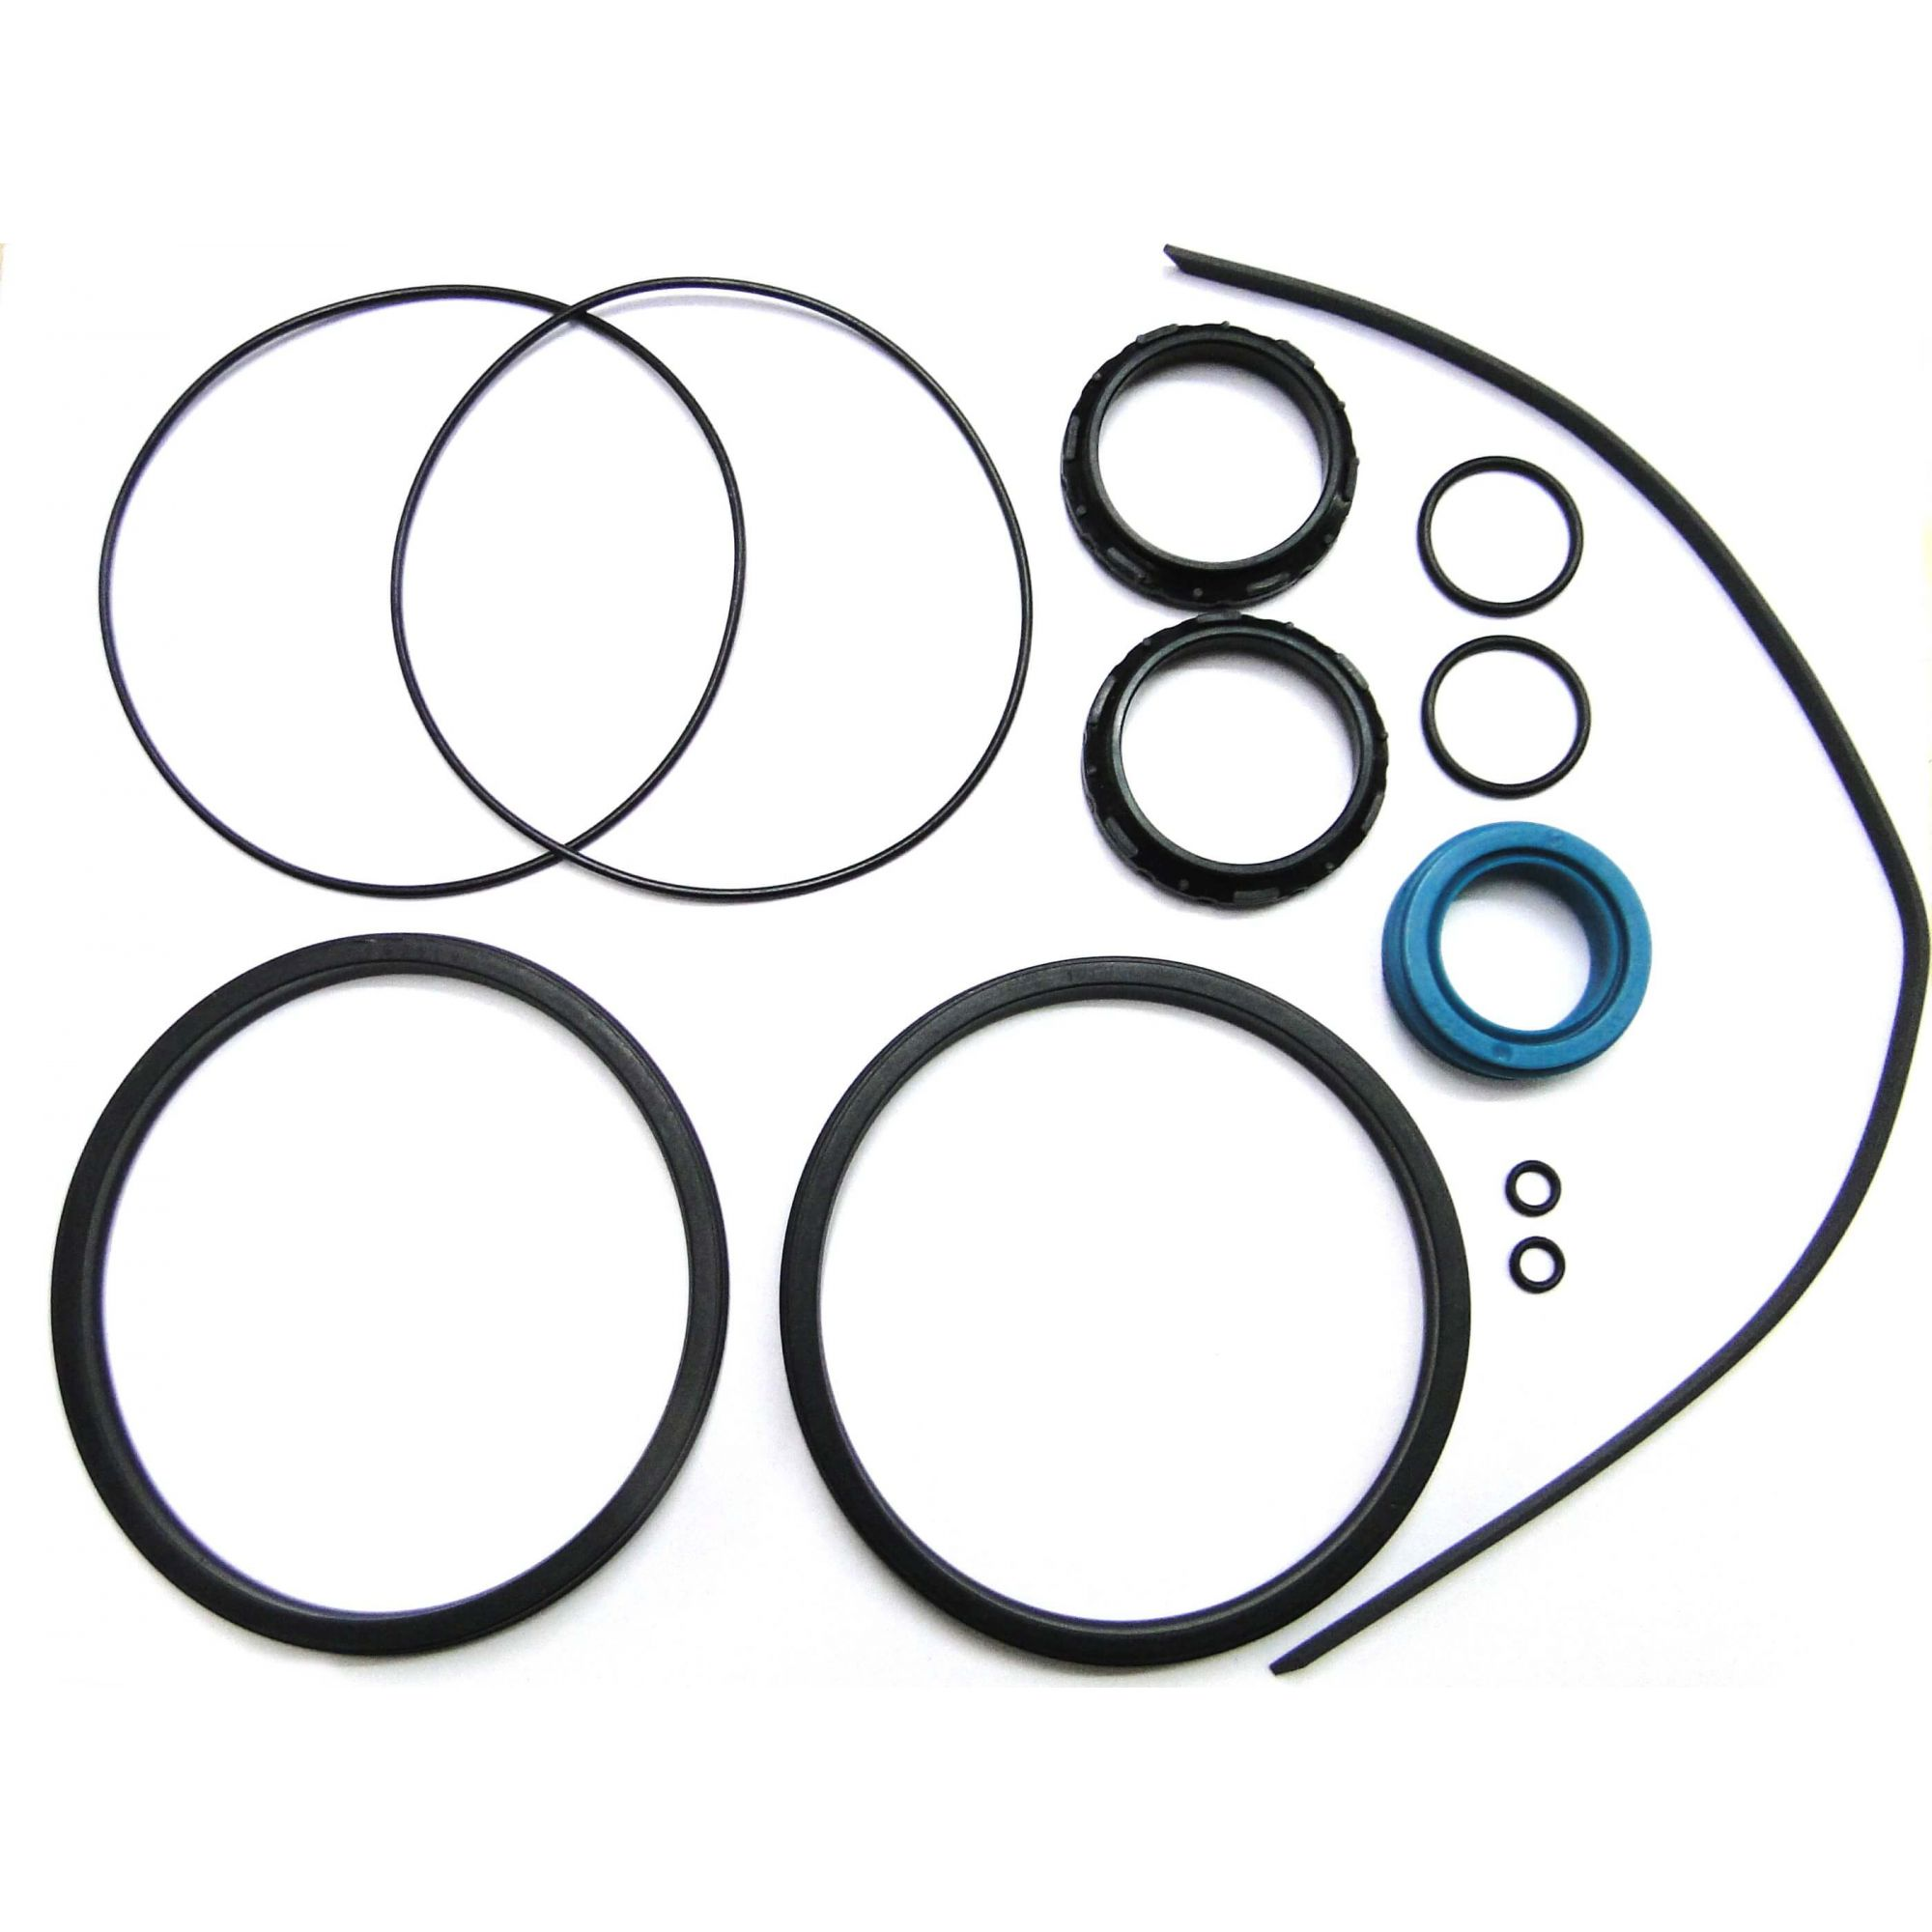 Kit Reparo para Cilindro Pneumático Haste Simples CWU100 Werk Schott